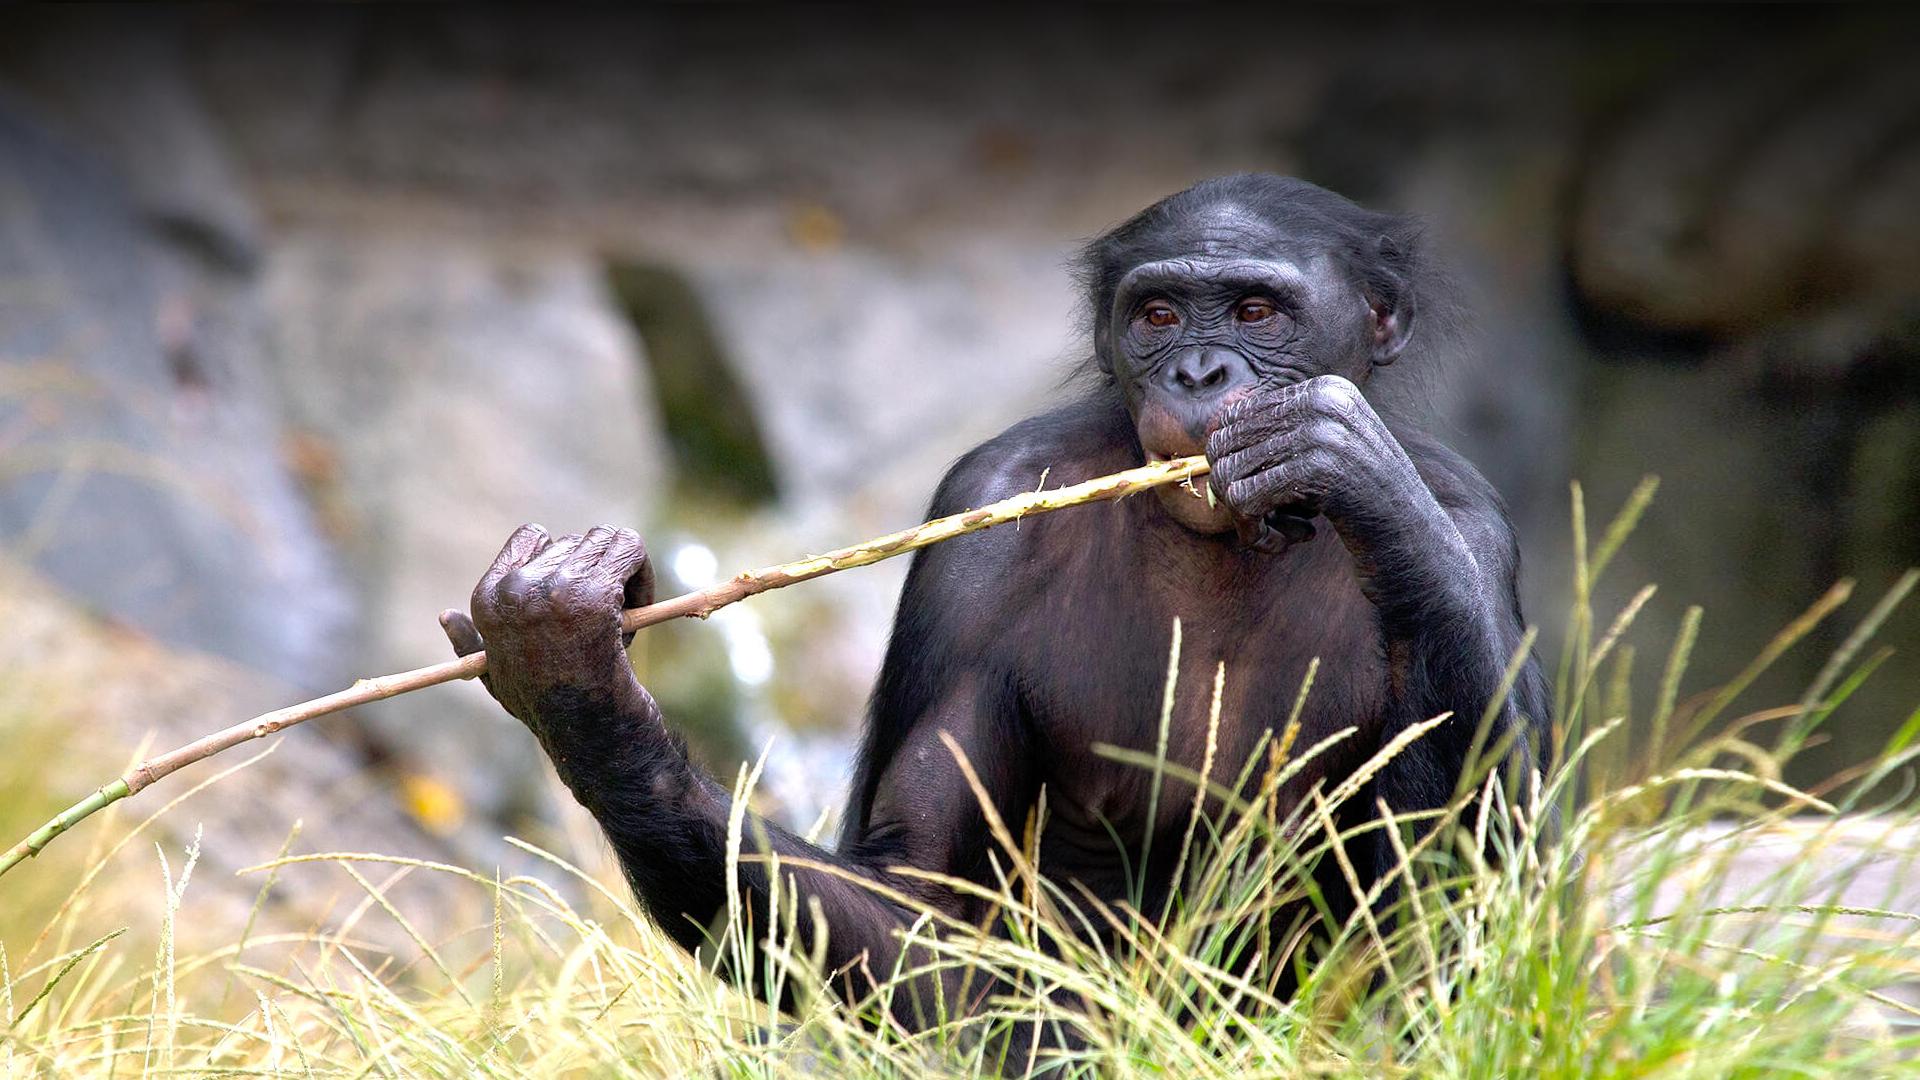 Bonobo | San Diego Zoo Animals & Plants